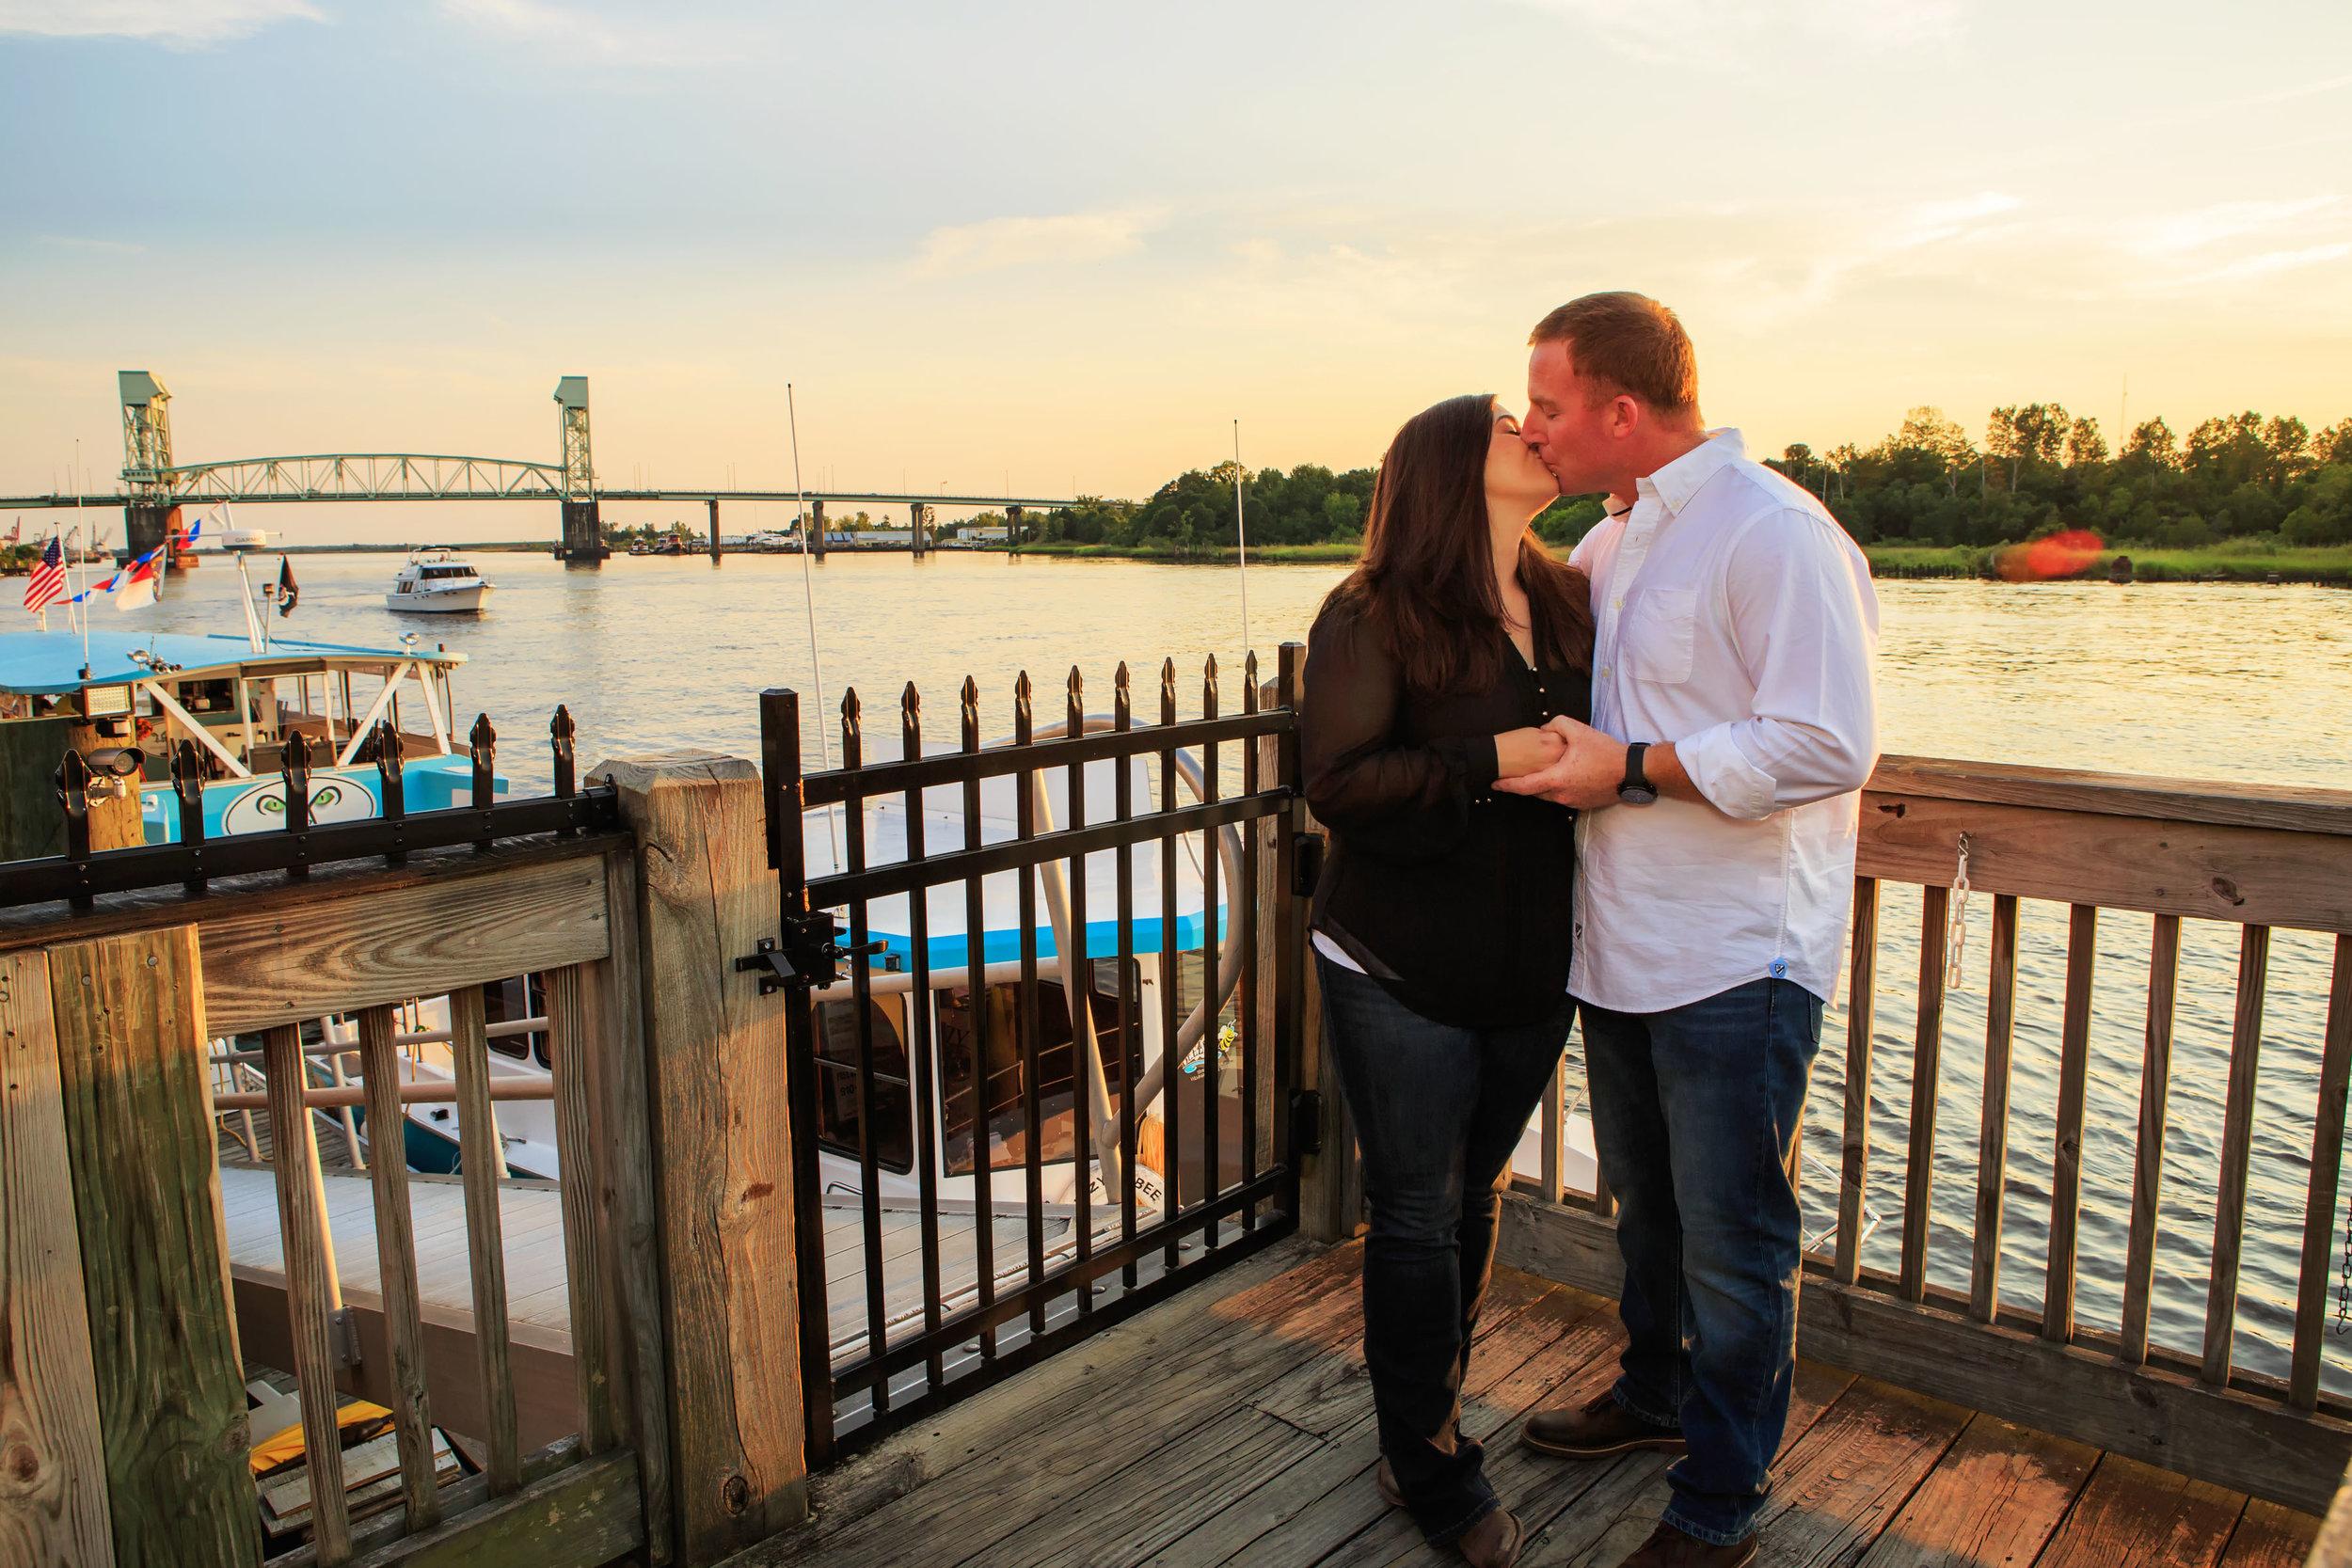 Wilmington_NC_Photographer_Tiffany_Abruzzo_Photography_Engagement_29.jpg